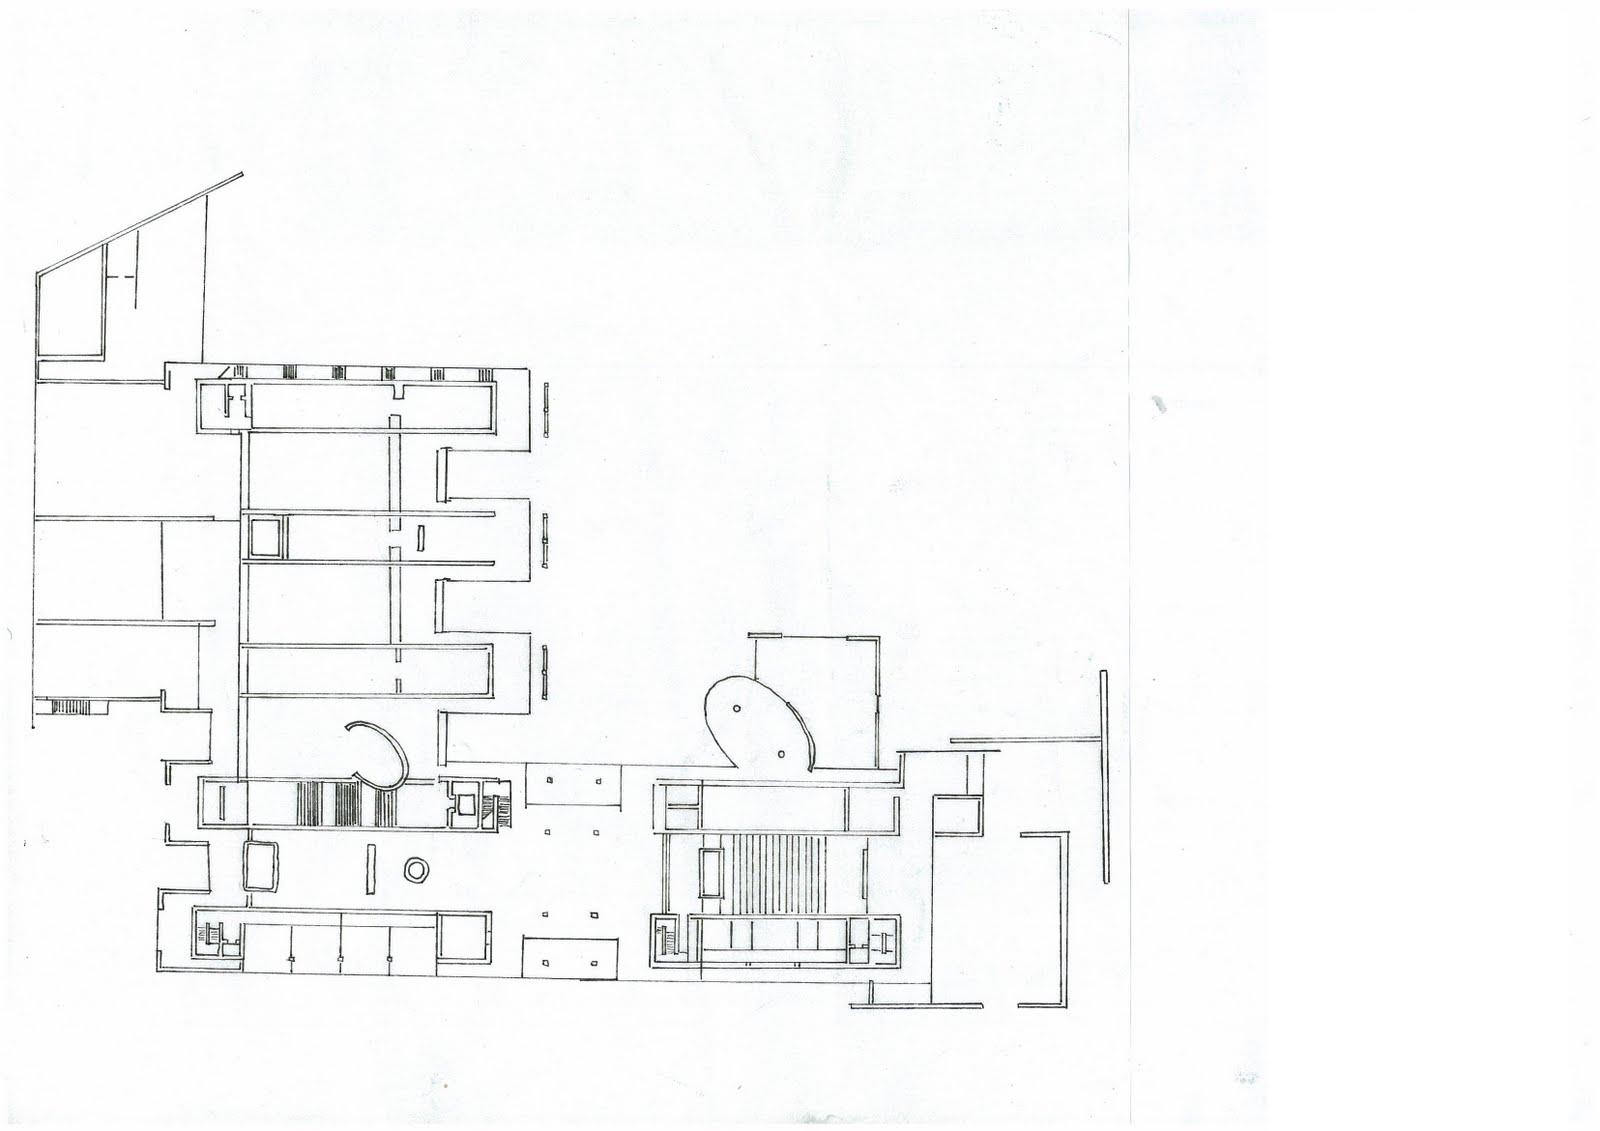 Plan Elevation Perspective : Pencils pen sj a site plan section elevation